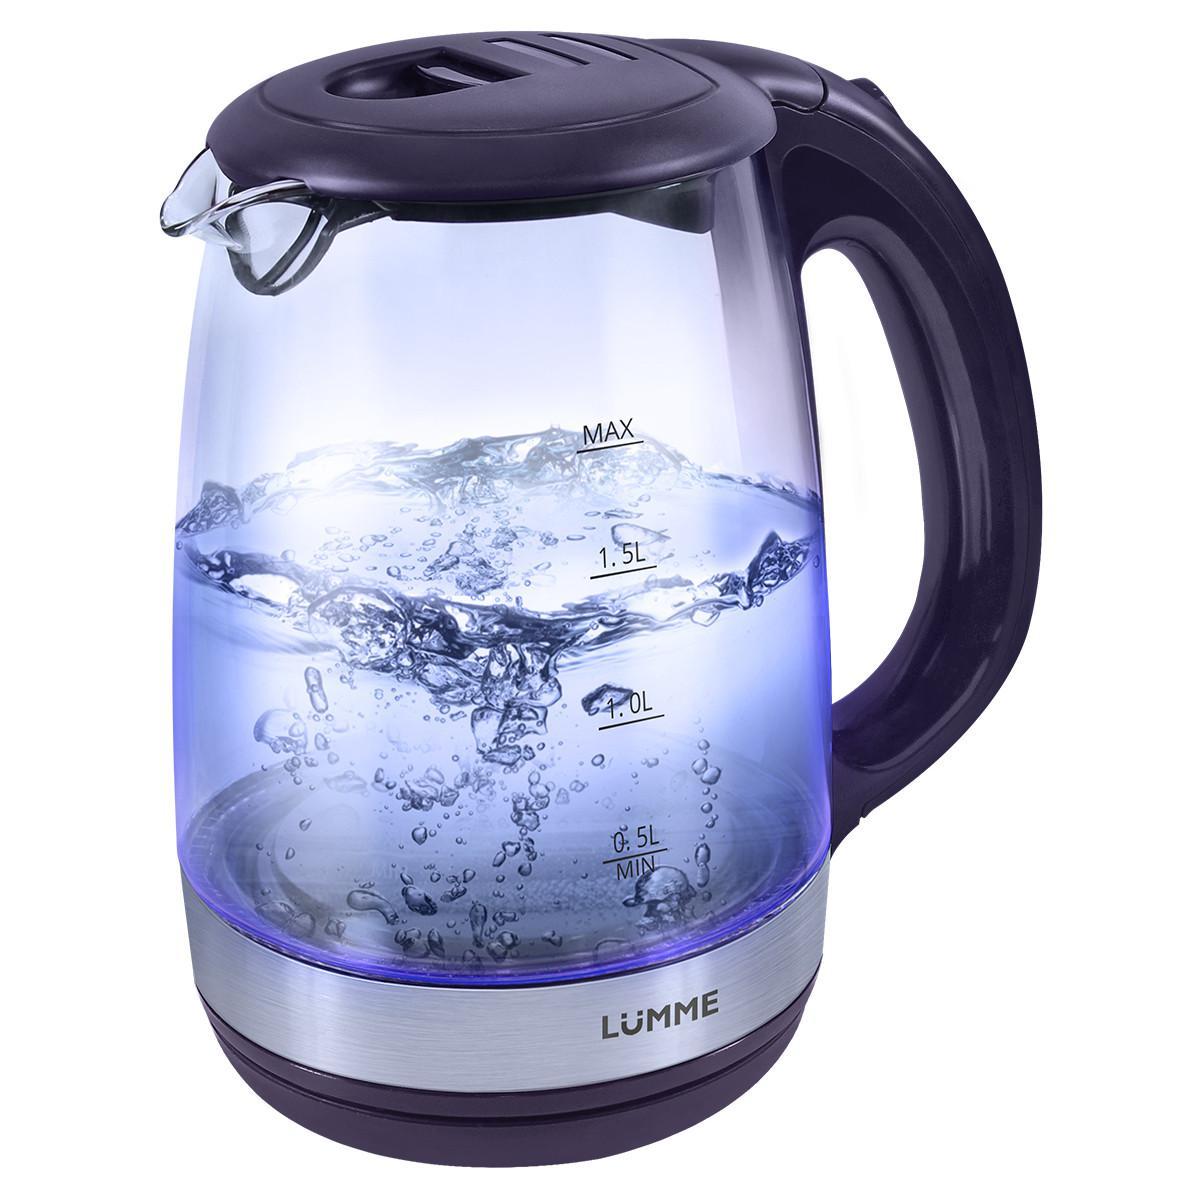 Чайник Lumme Lu-135 синий сапфир чайник lumme lu 134 2200 вт черный жемчуг 2 л стекло